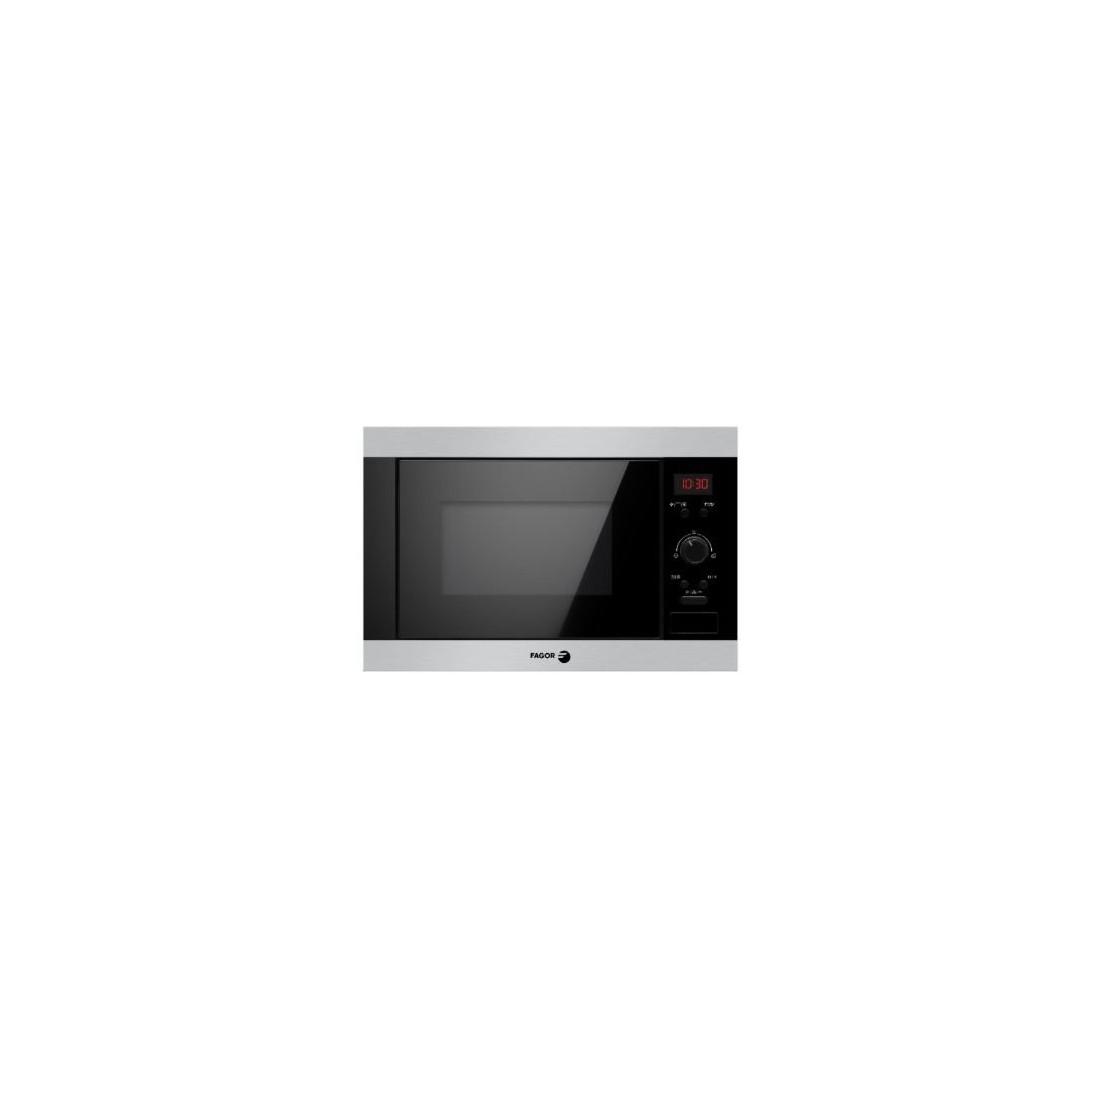 Microondas Integrable - Fagor 3MWB-25BEGX, Acero Inoxidable y negro